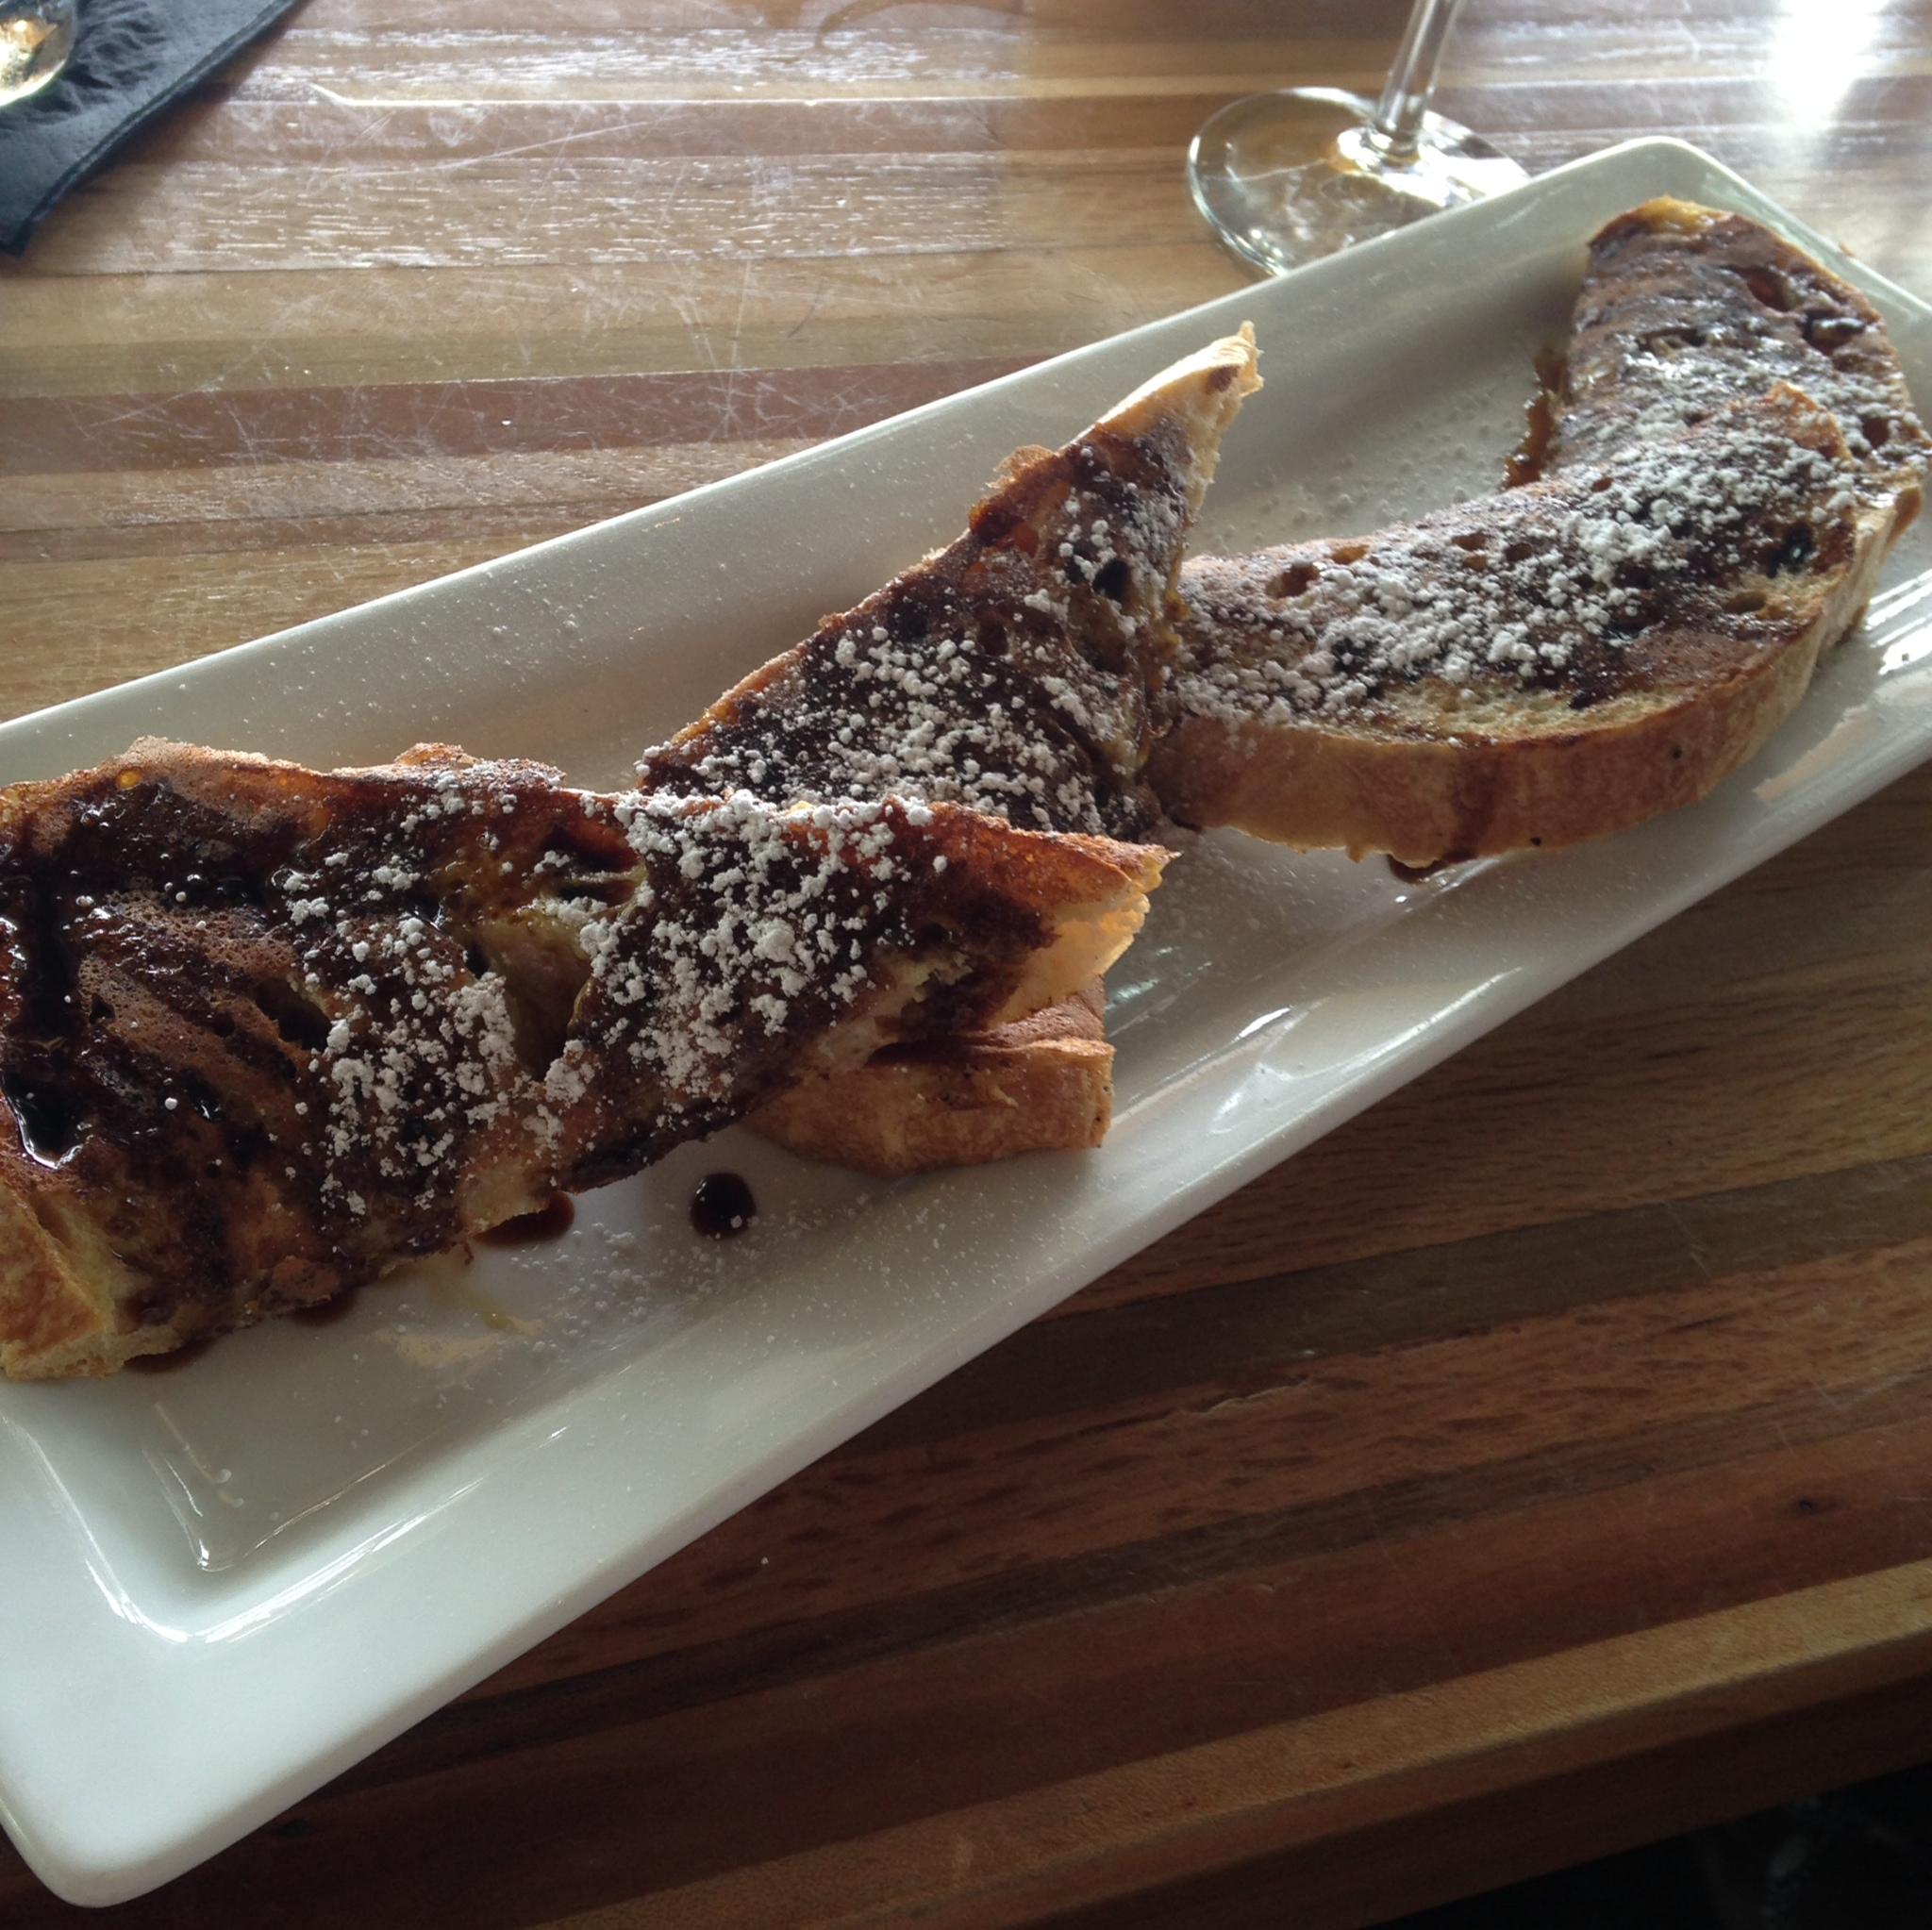 French Toast - The Flying Squirrel - Niedlov's sourdough, orange molasses, powdered sugar.